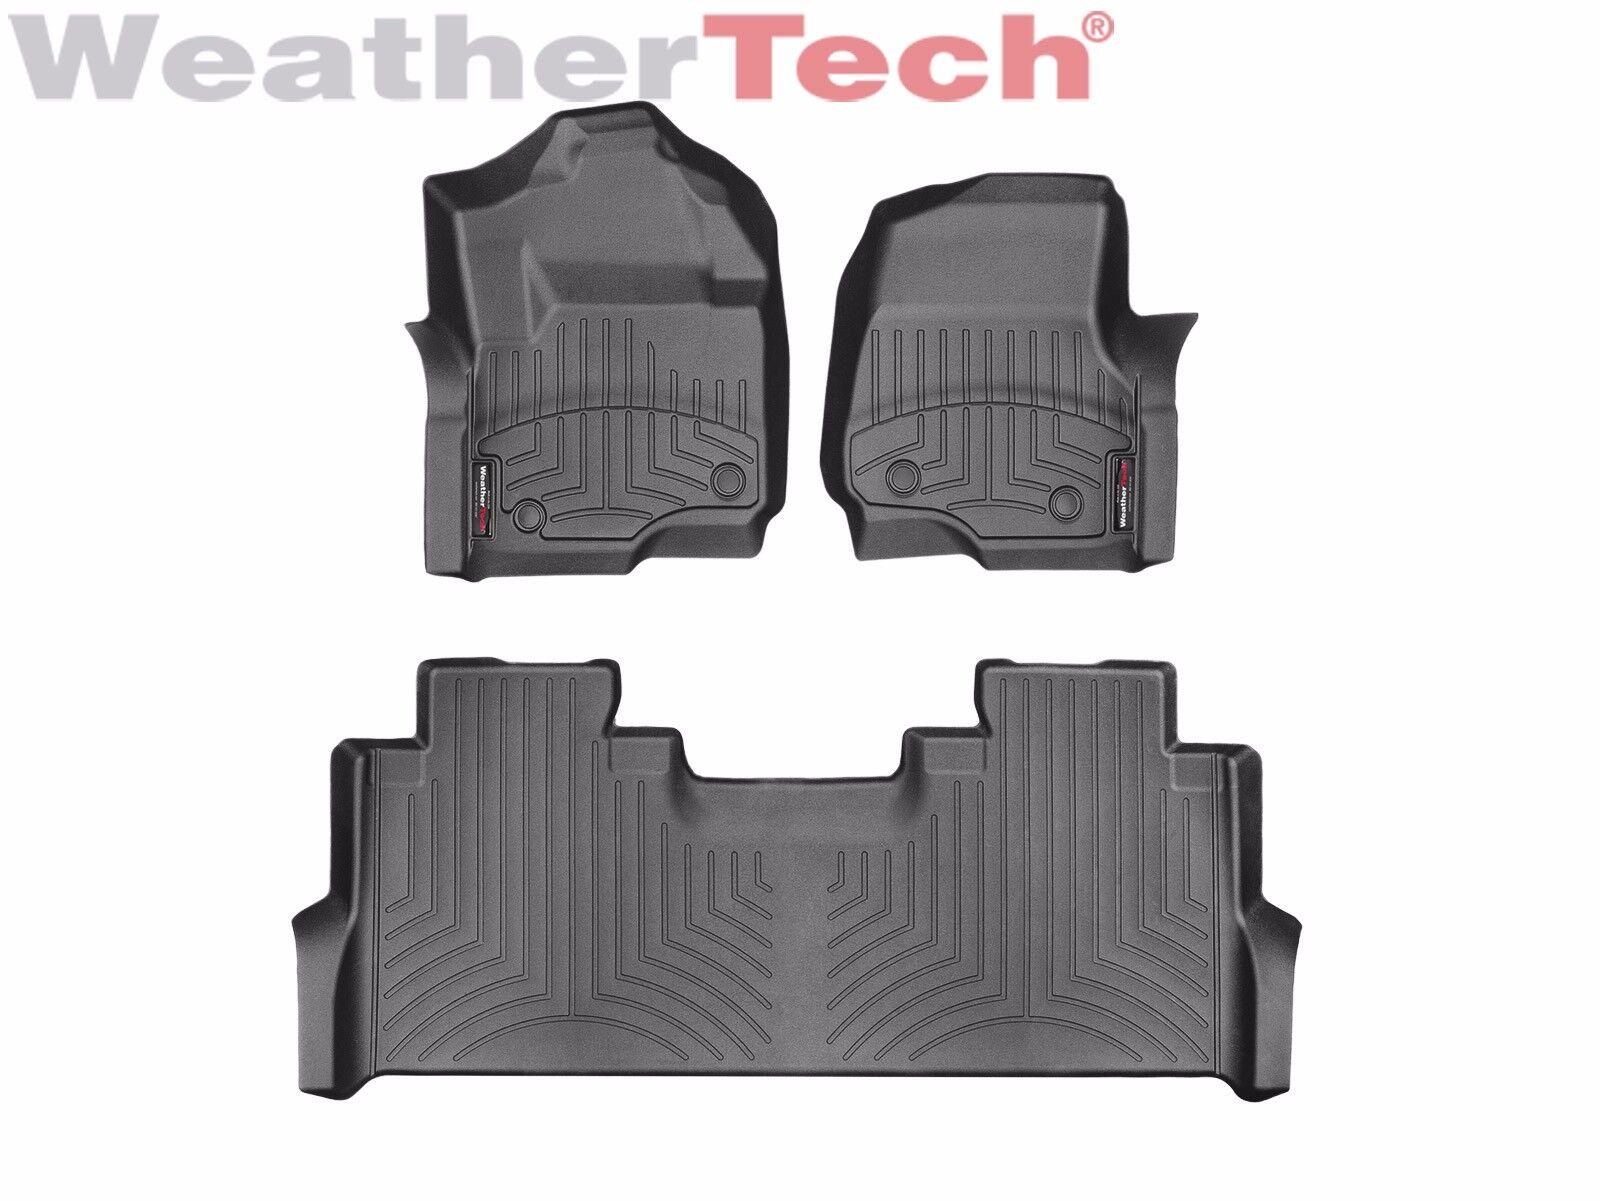 Weathertech Floor Mats Floorliner For Ford Super Duty Crew Cab 2017 2019 Black Ebay